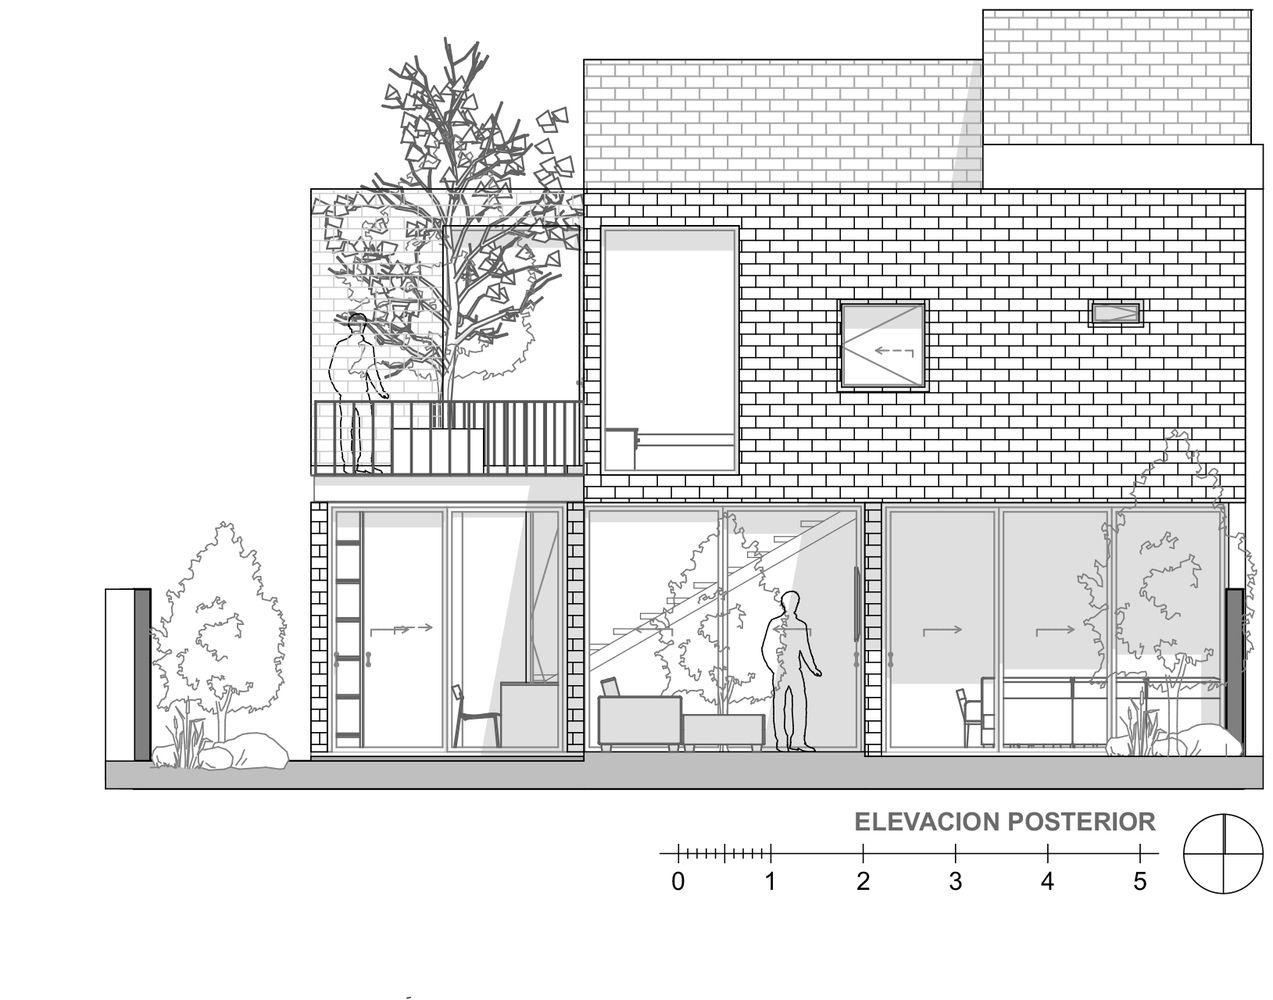 Galer a de casa robles atier arquitectura 25 casa for Disenos de casas rusticas de ladrillo